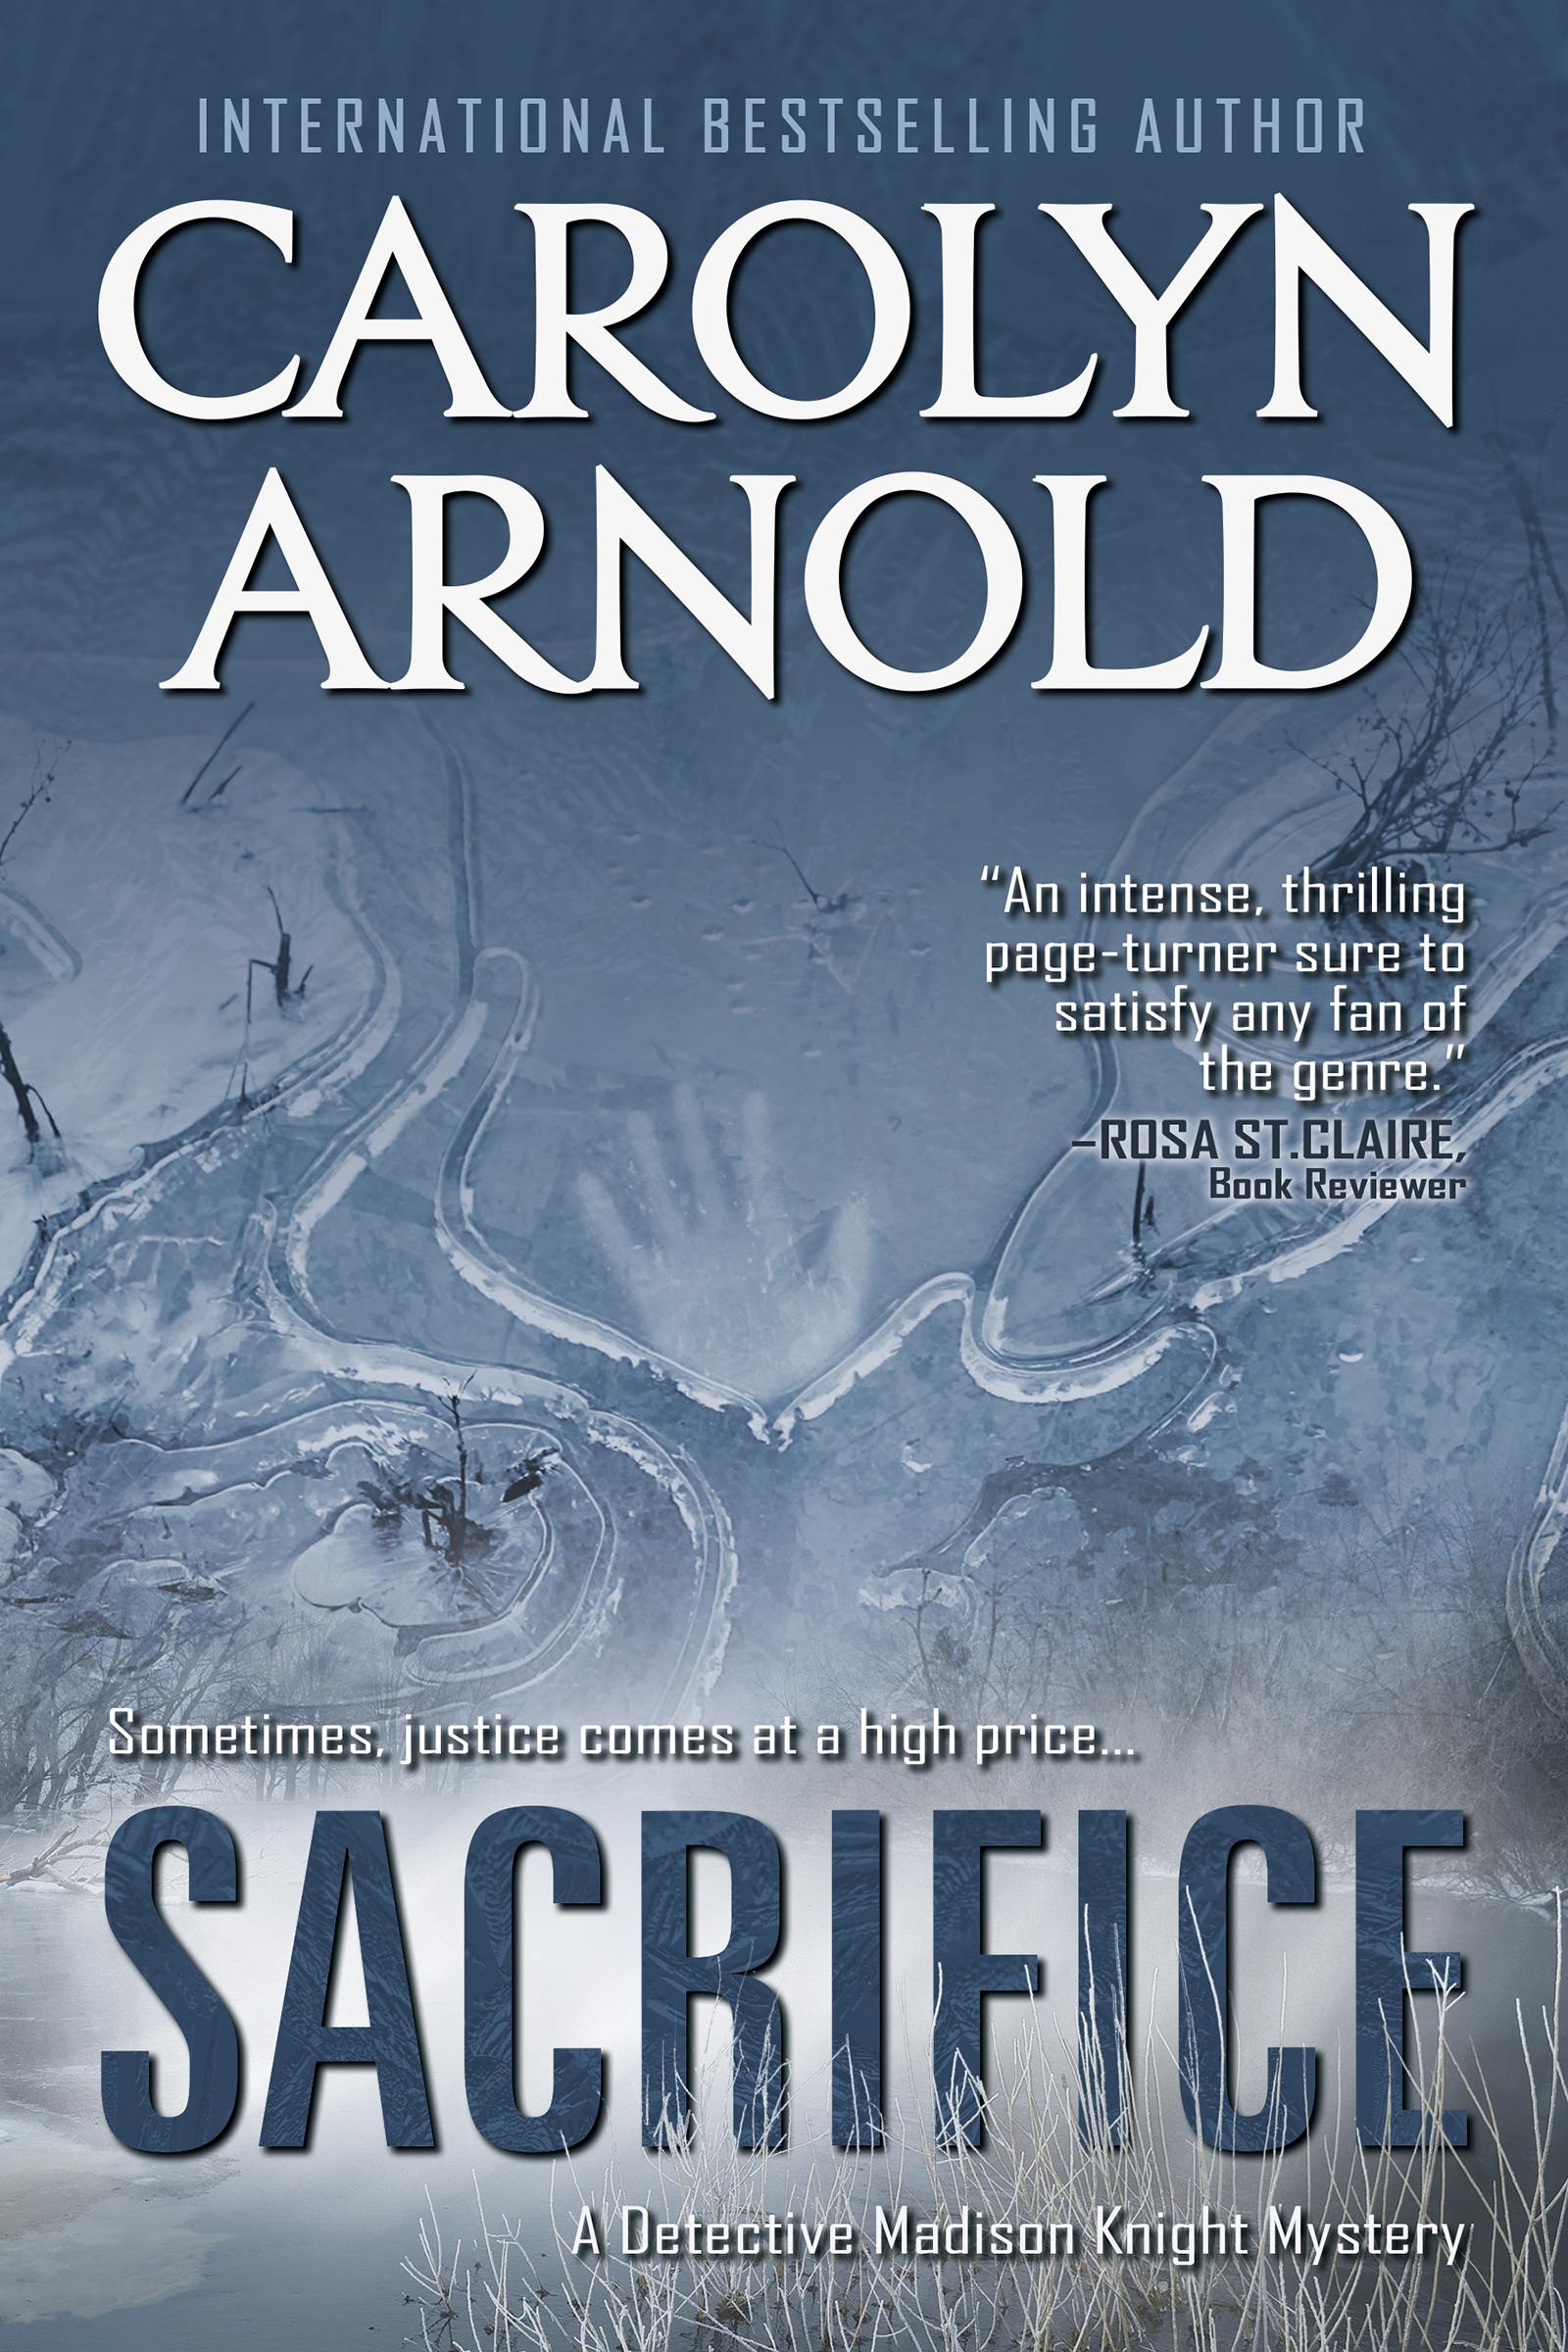 Sacrifice, an Ebook by Carolyn Arnold